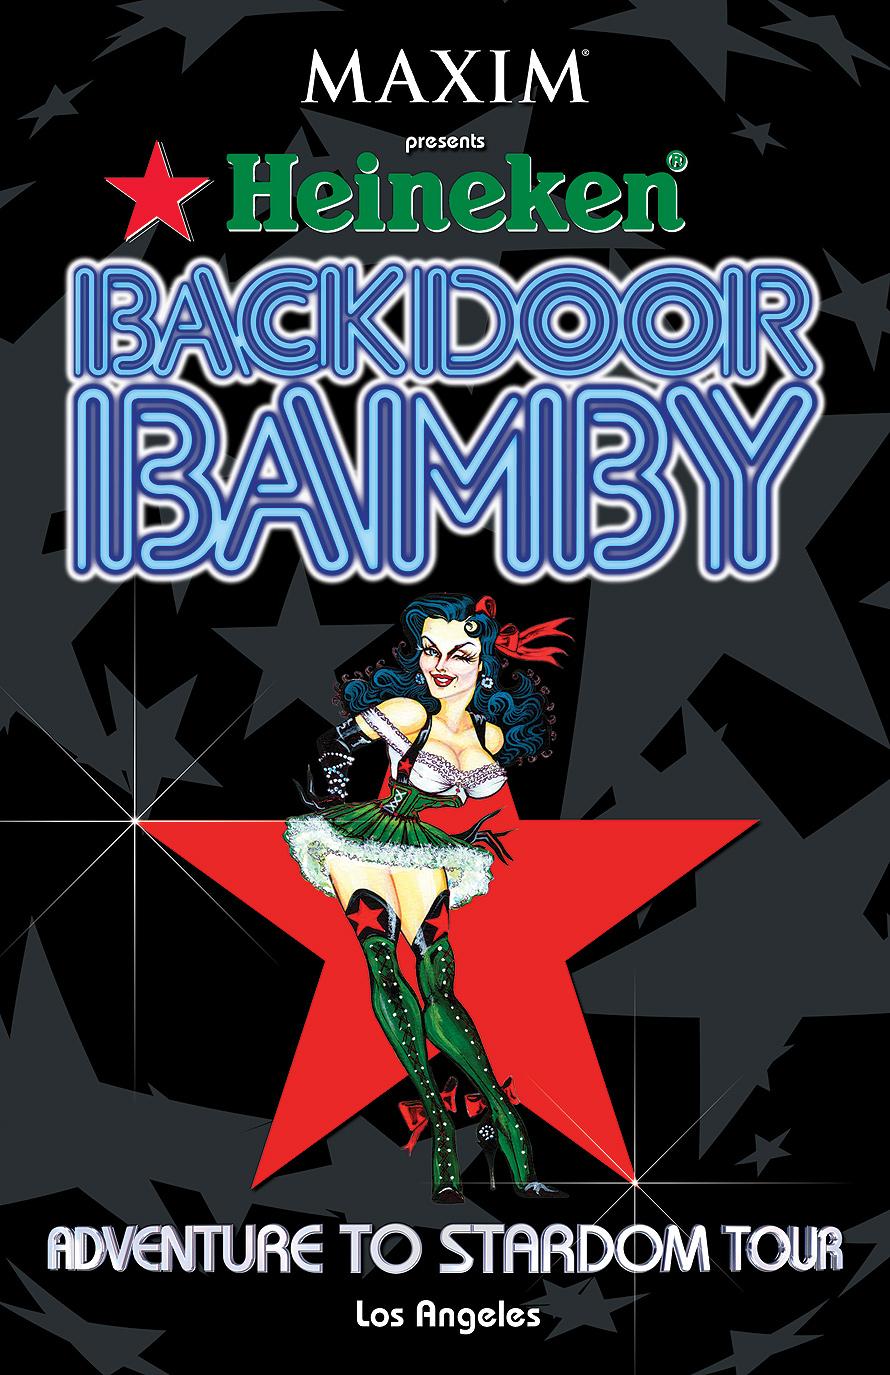 Back Door Bamby Ivar